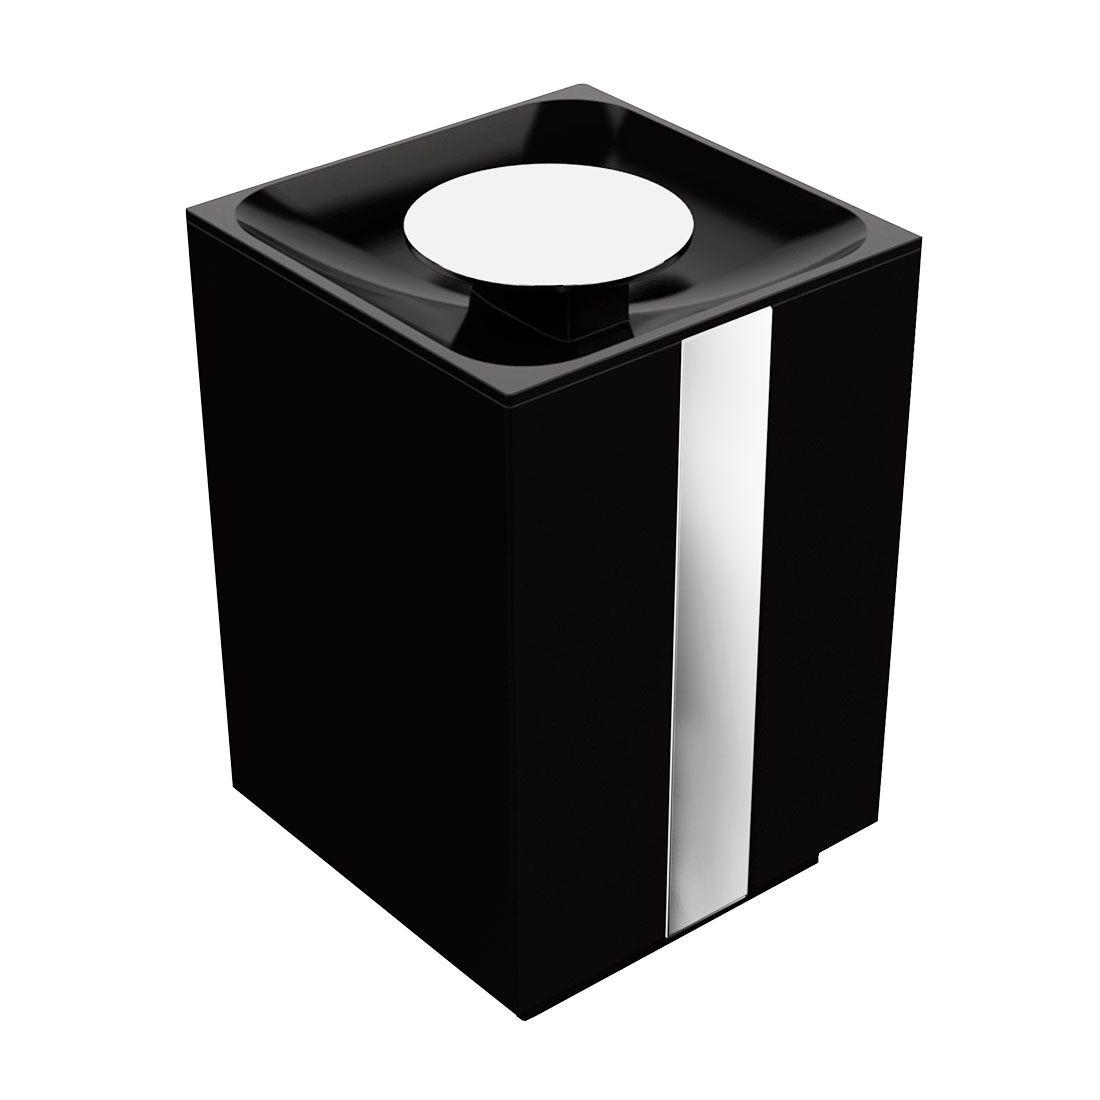 Lixeira de Chão 5 Litros Anello/Miss/Woman/Soho para Banheiros e Lavabos